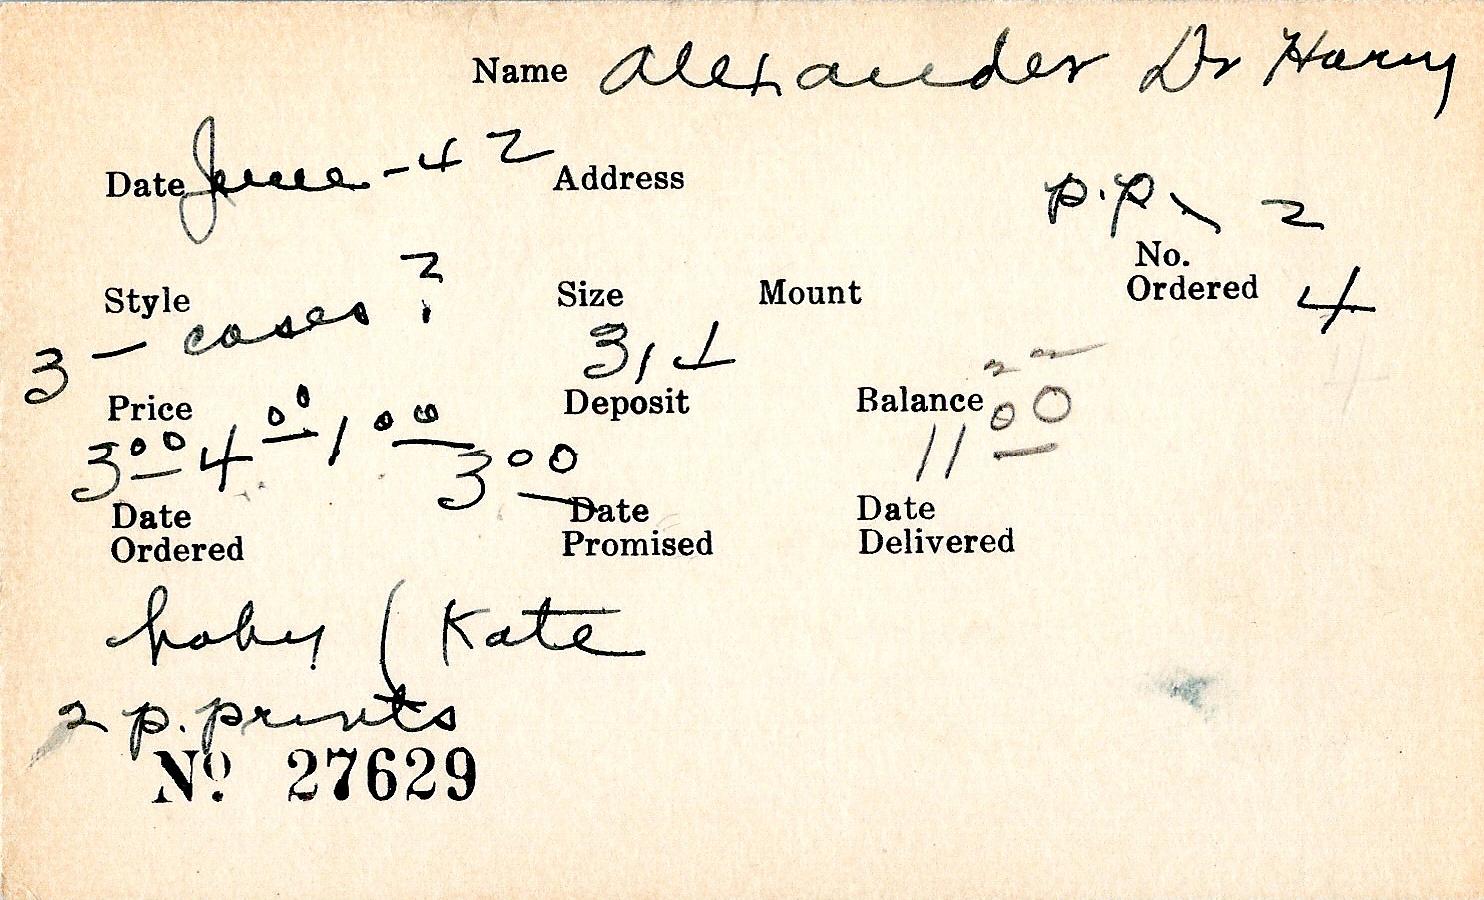 Index card for Harry Alexander